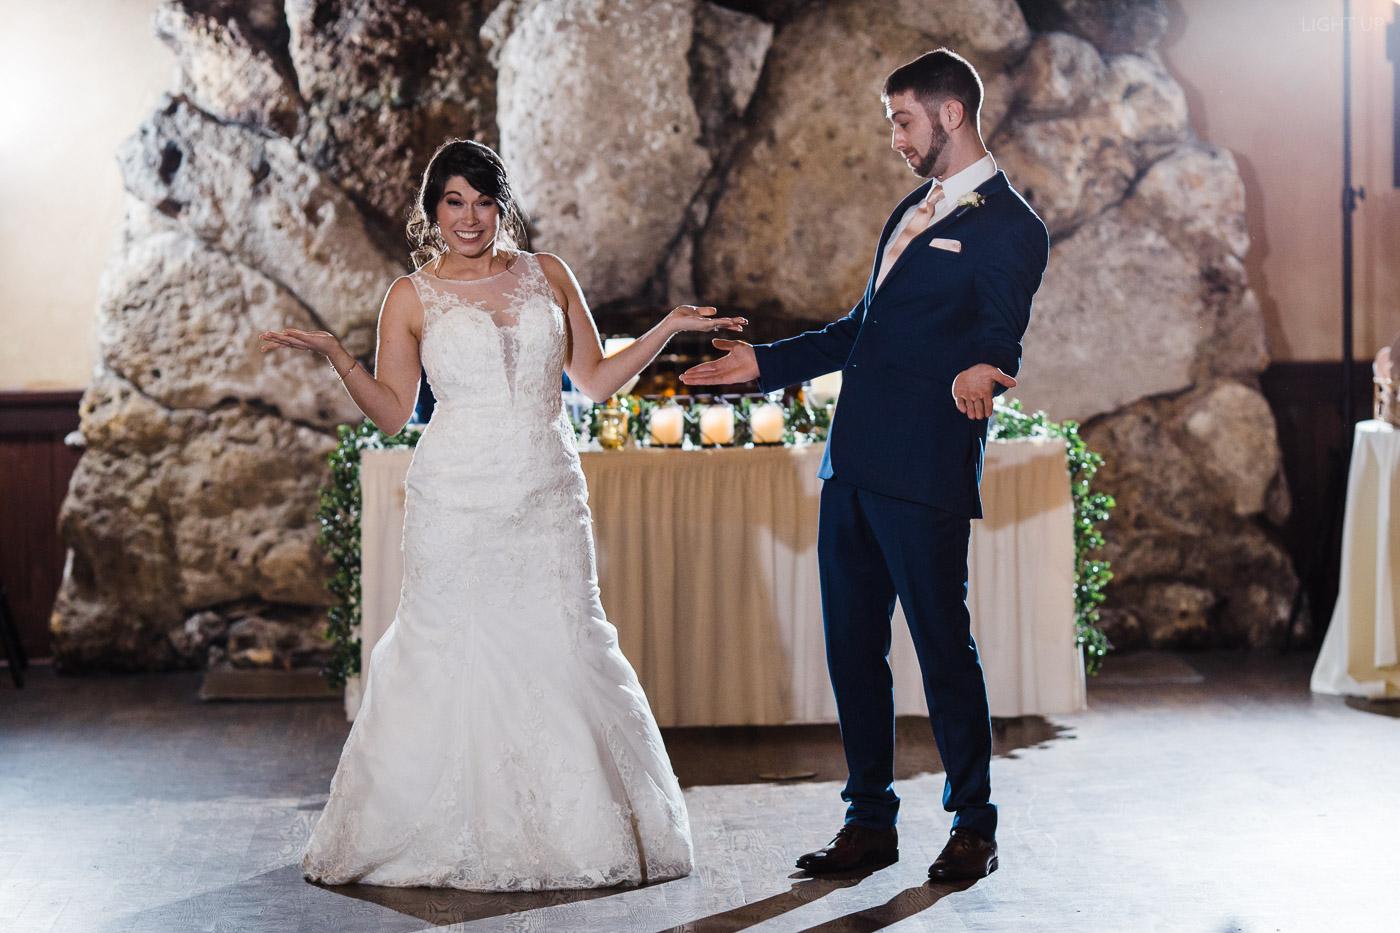 hstoric-dubsdread-wedding-orlando-58.jpg